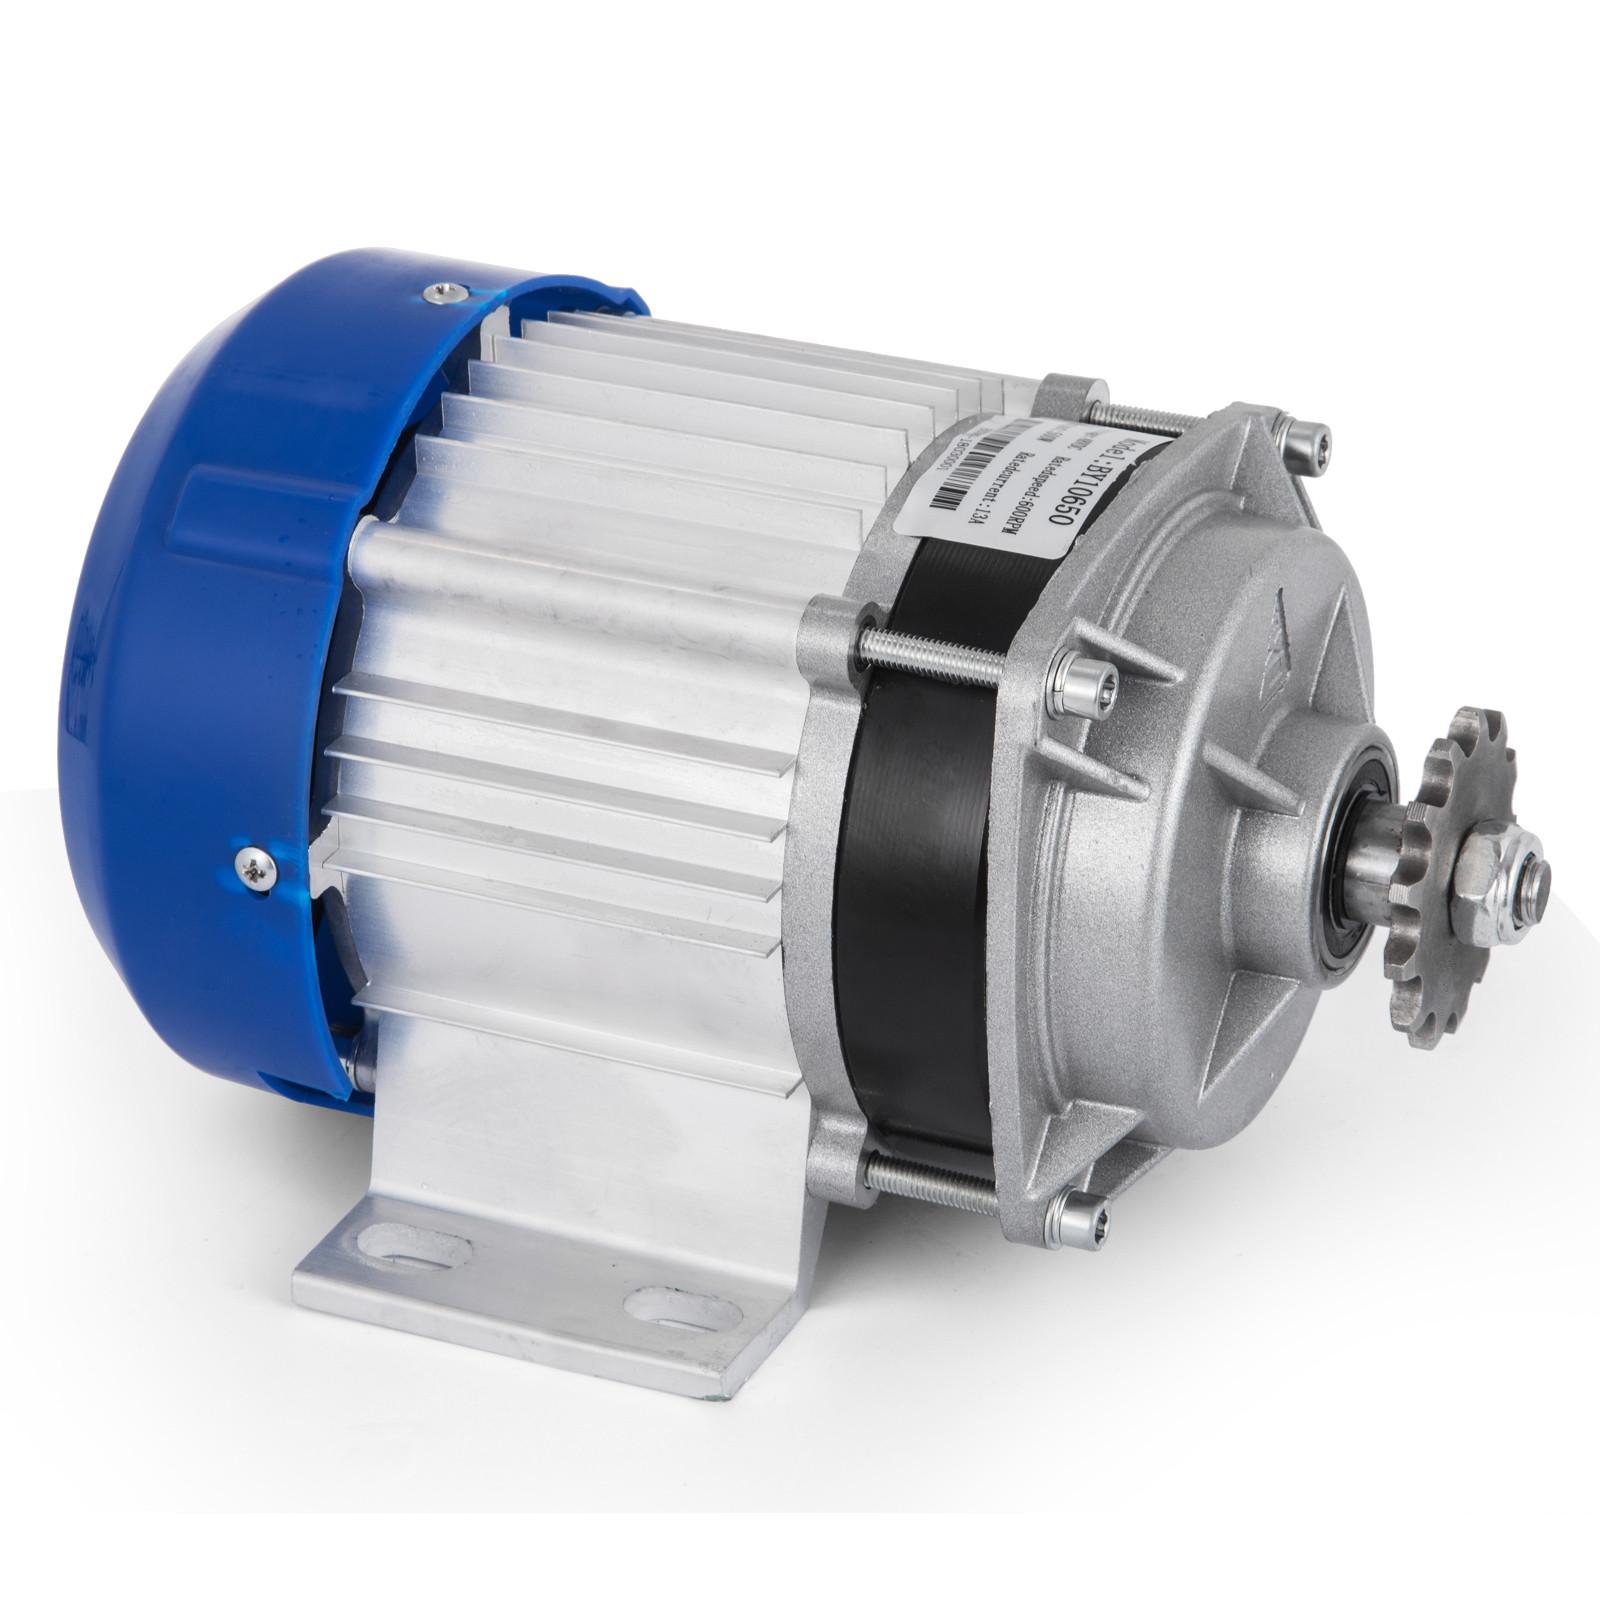 1800W-48V-DC-Brushless-Electric-Motor-Kit-f-Scooter-500-1800W-E-Bike-Go-Kart thumbnail 136